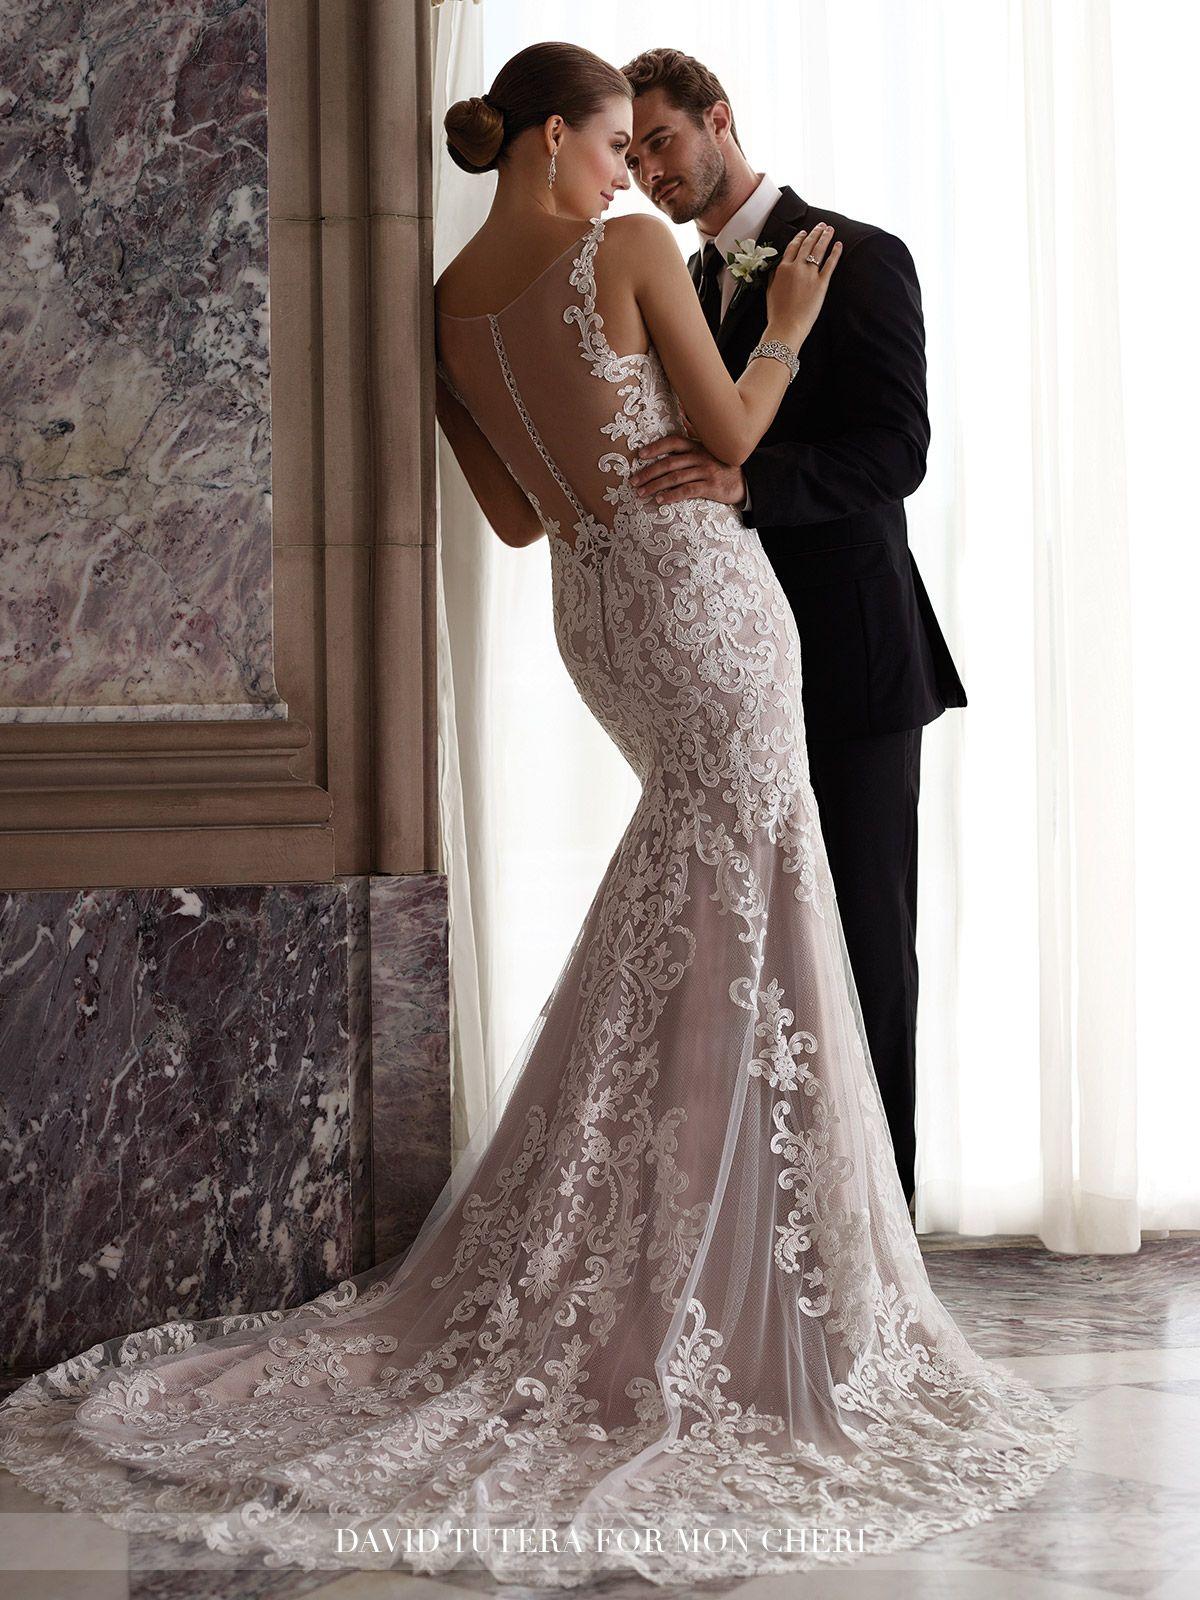 David Tutera Wedding Dresses [Amber] At Best Bridal Prices